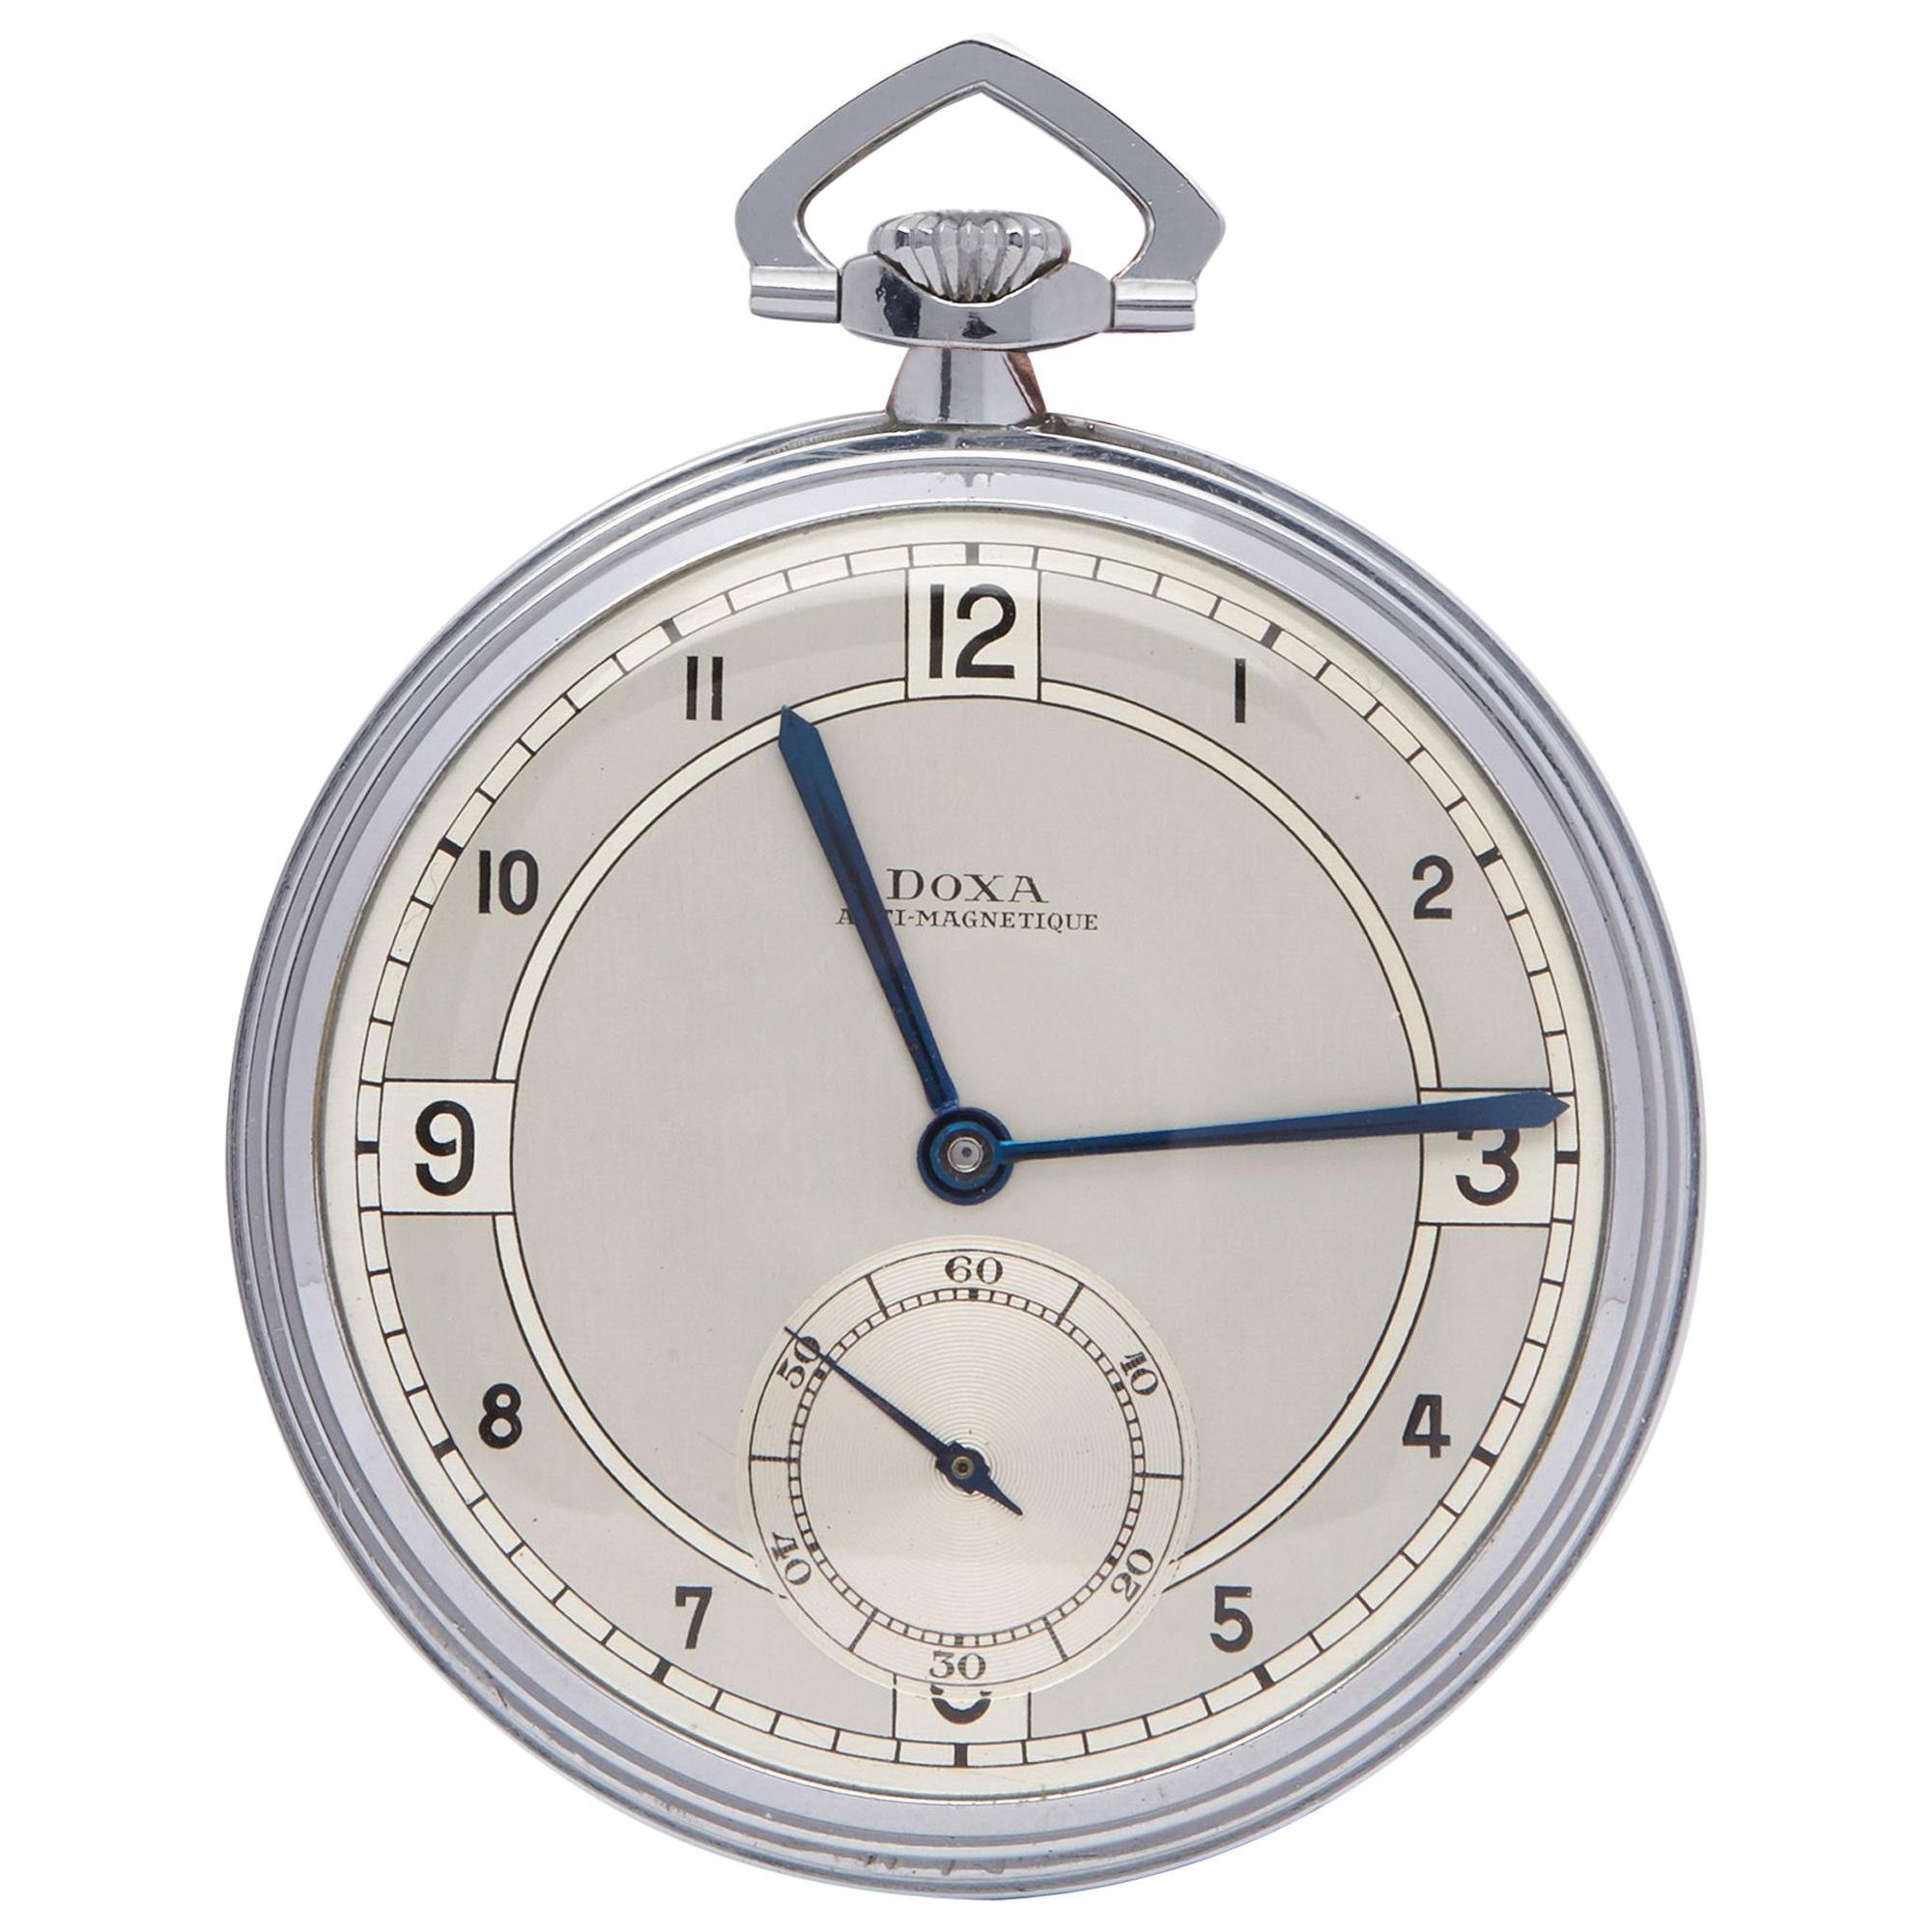 Doxa Pocket Watch Unisex Stainless Steel NOS Watch